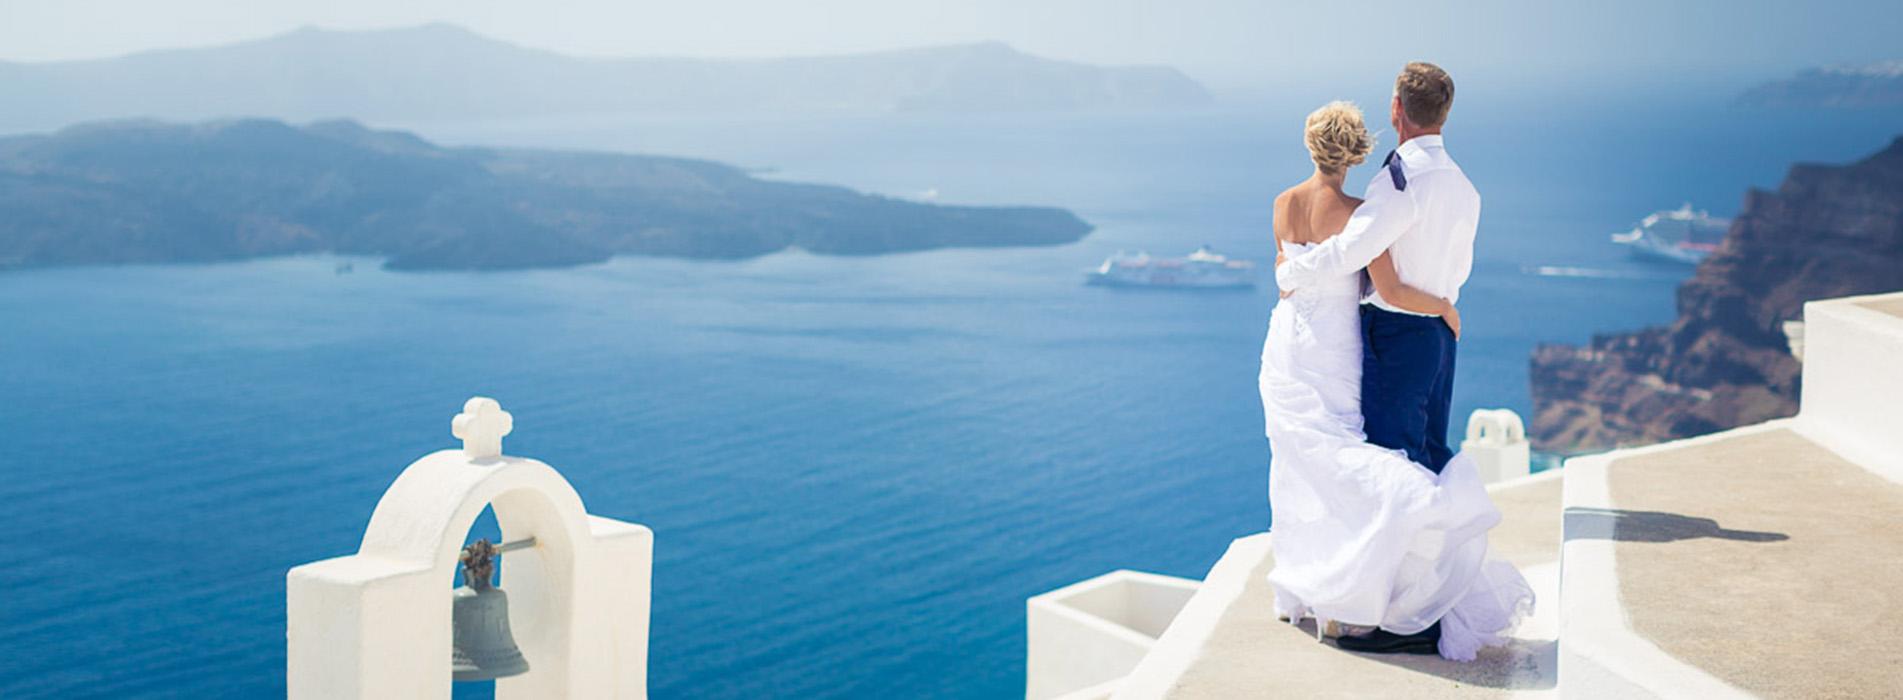 Greece - Santorini Weddings 7 (main)